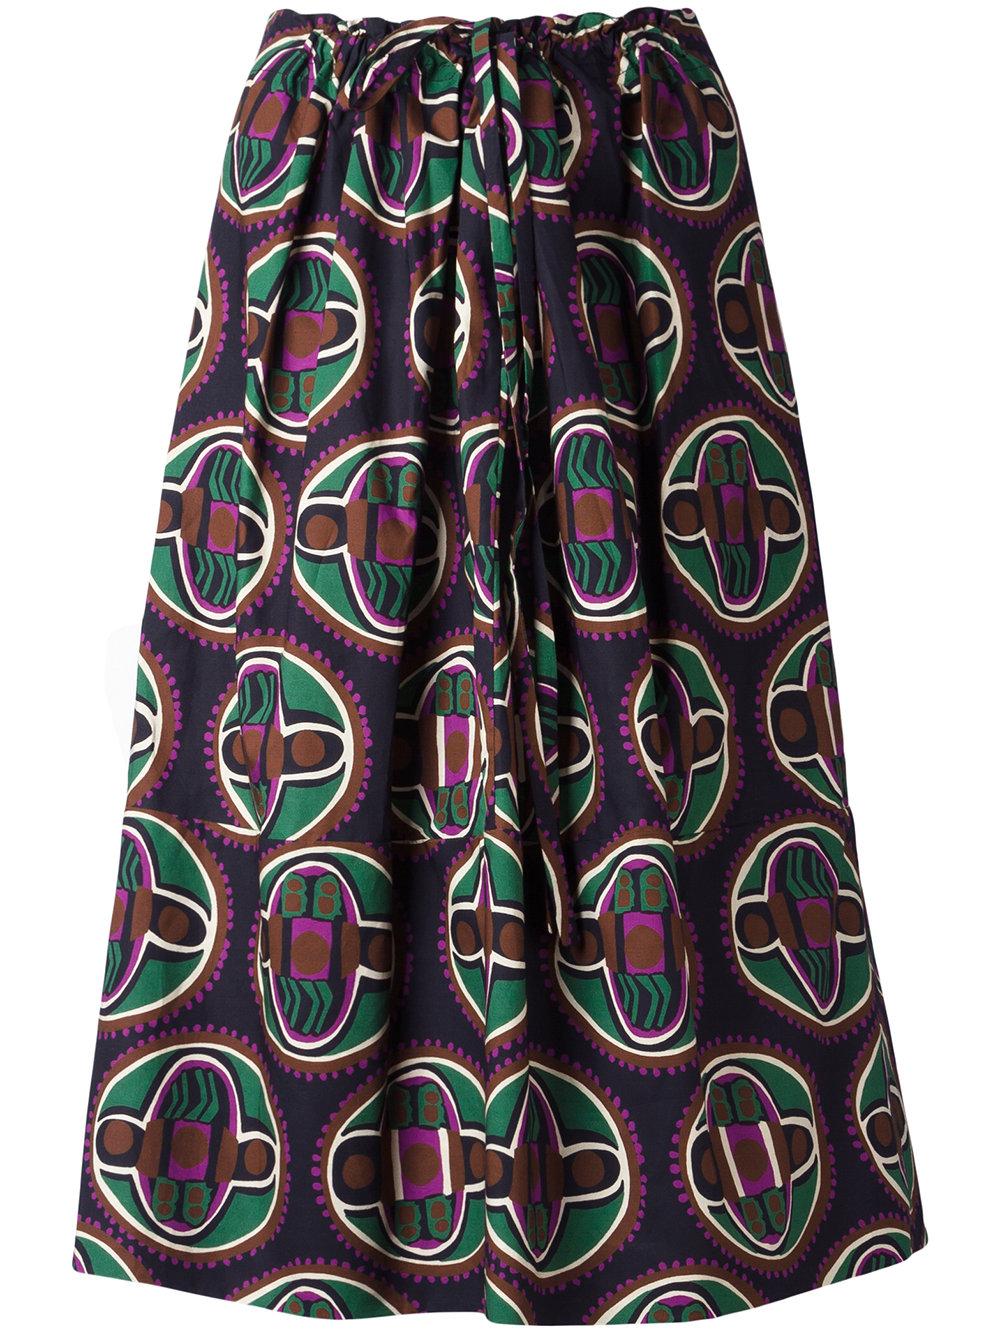 $346 - Aspesi Geometric Print Drawstring Skirt